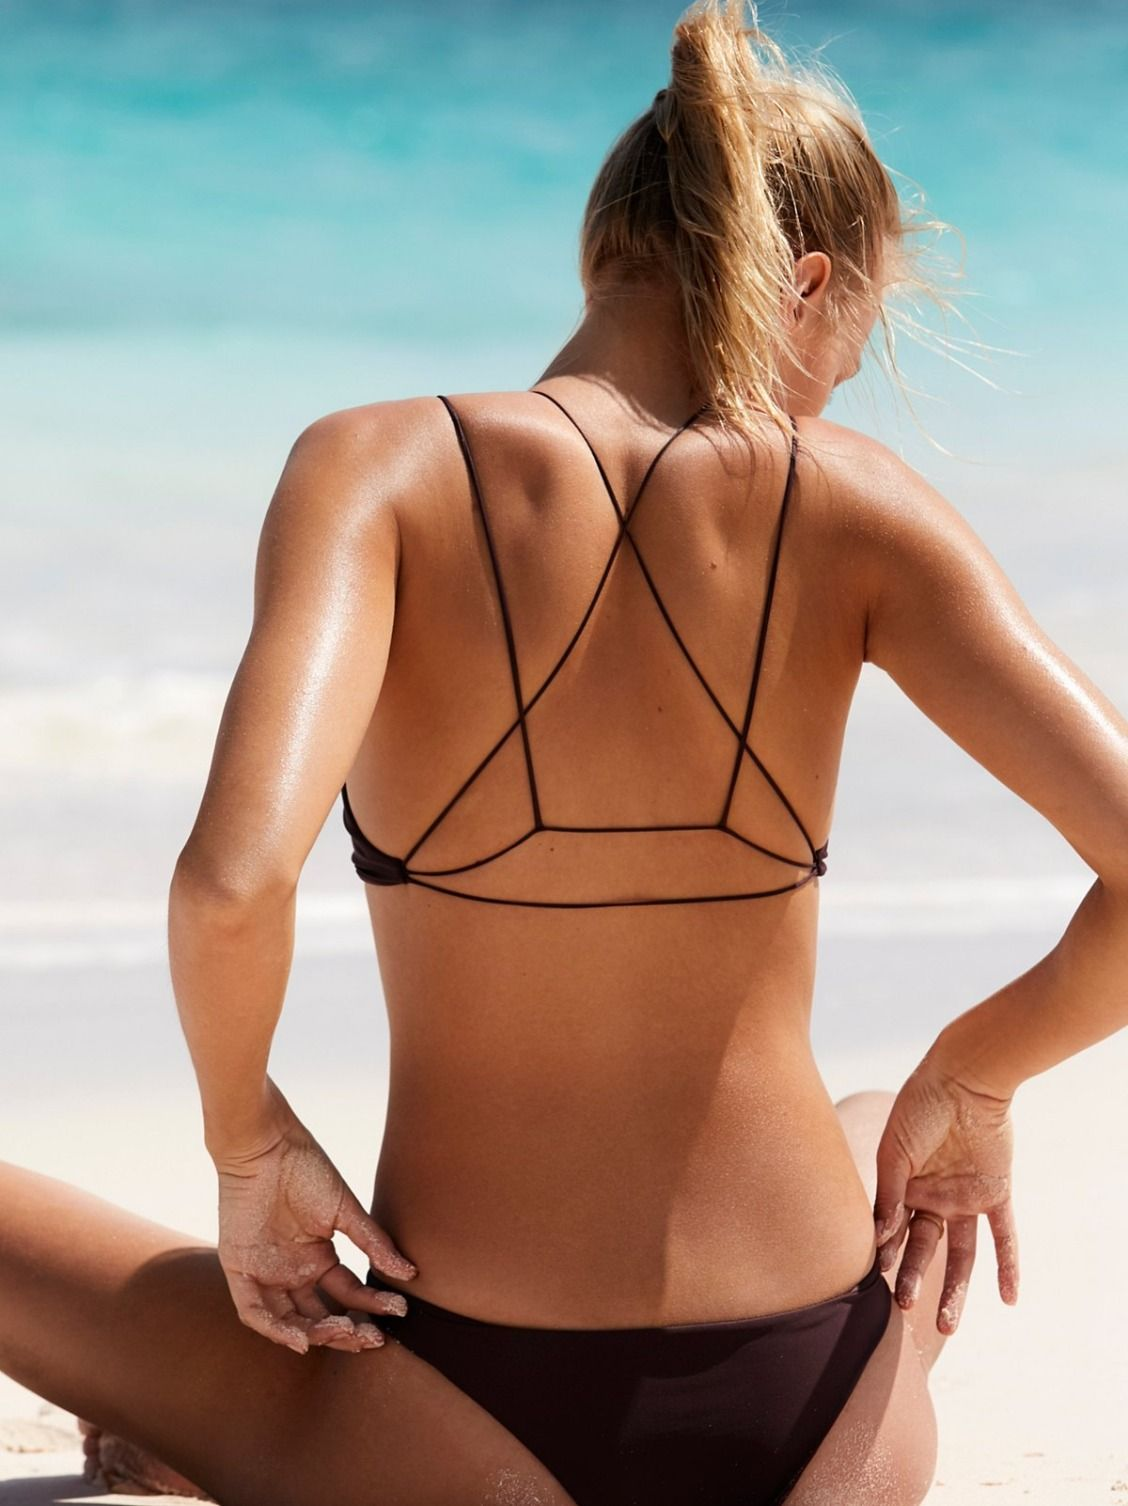 Alapio Bikini Top   In a pull-on style this bikini top features a strappy back.